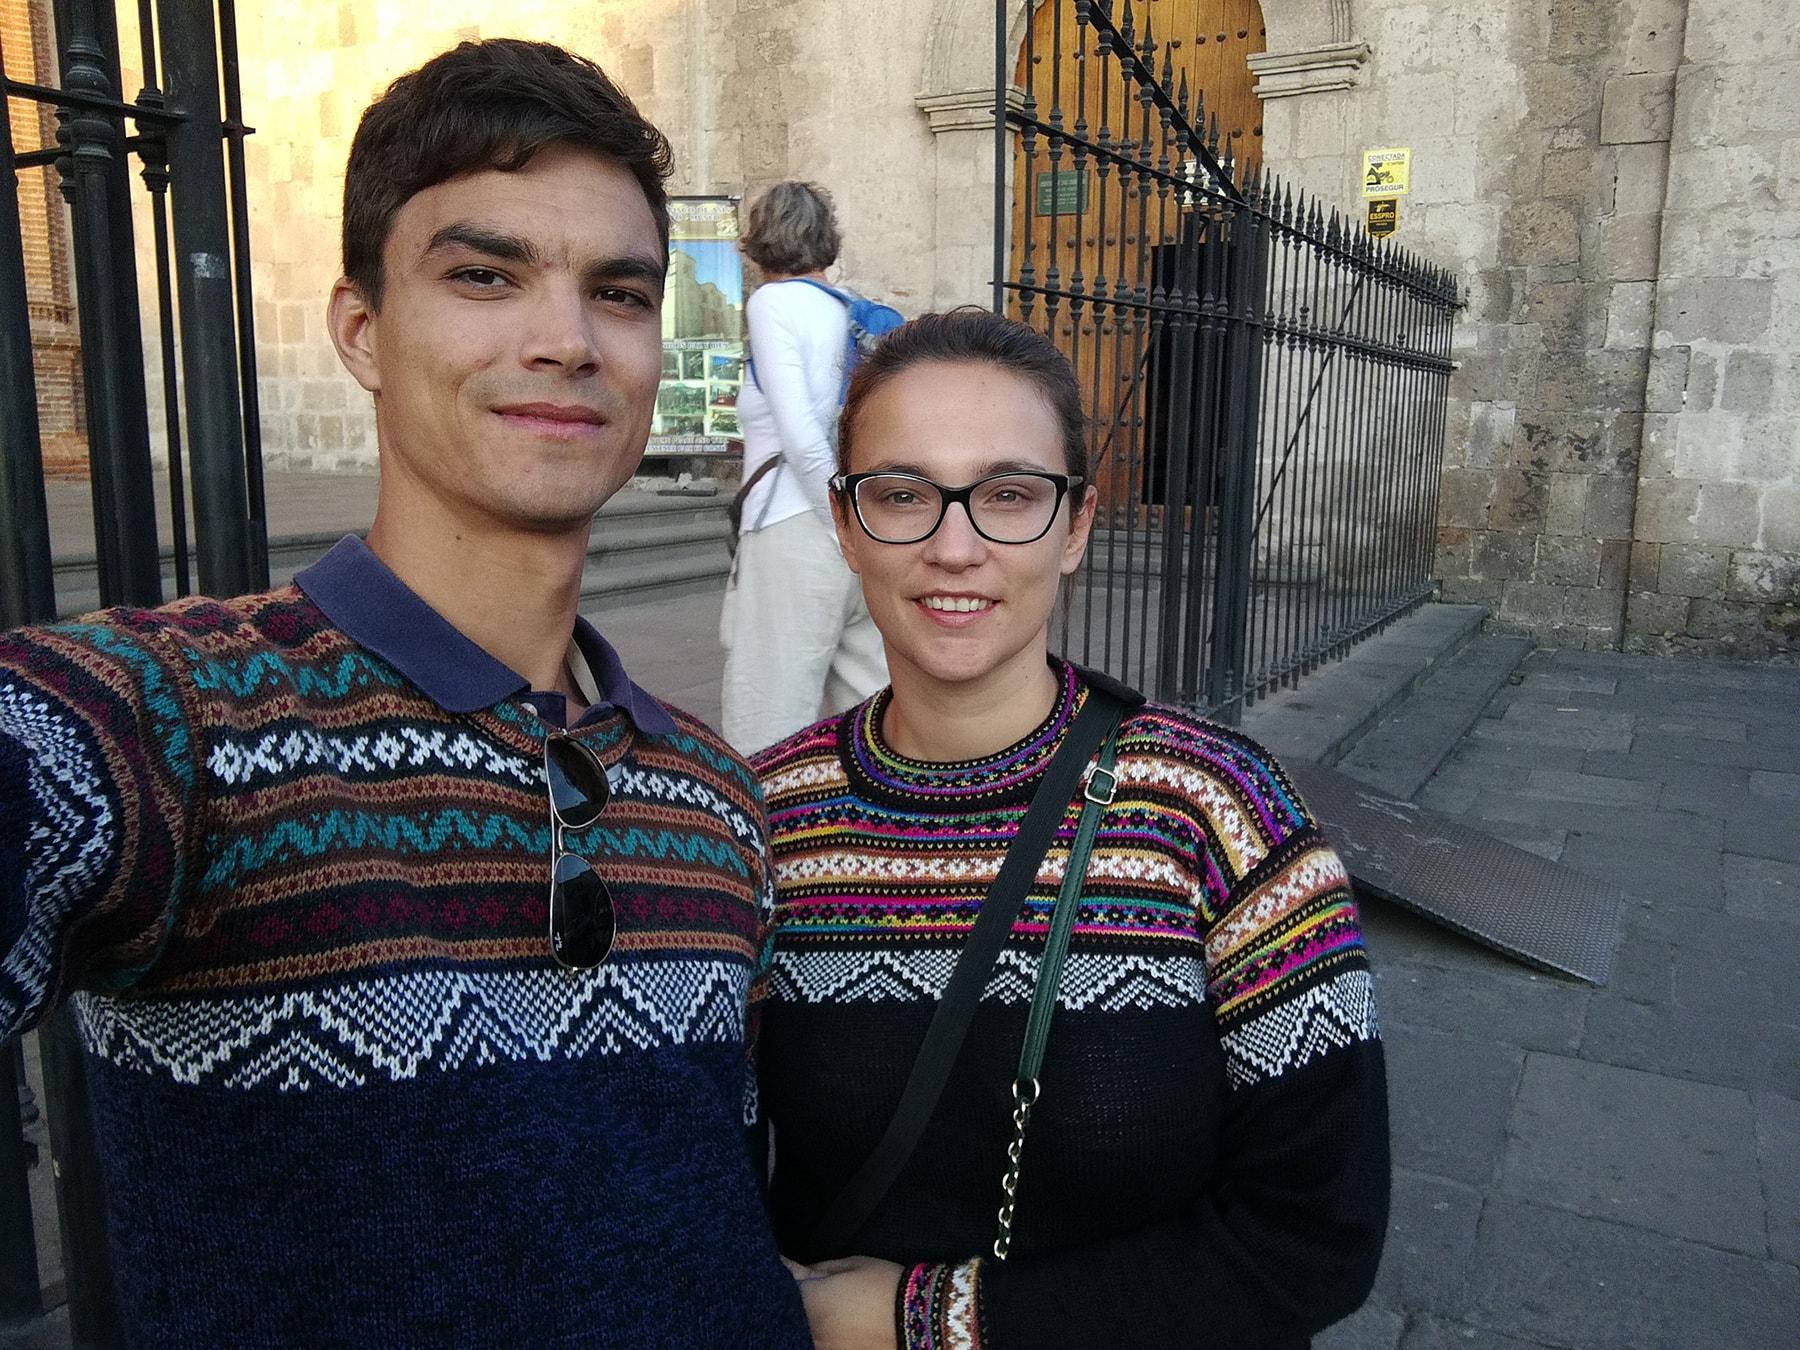 Les pulls péruviens